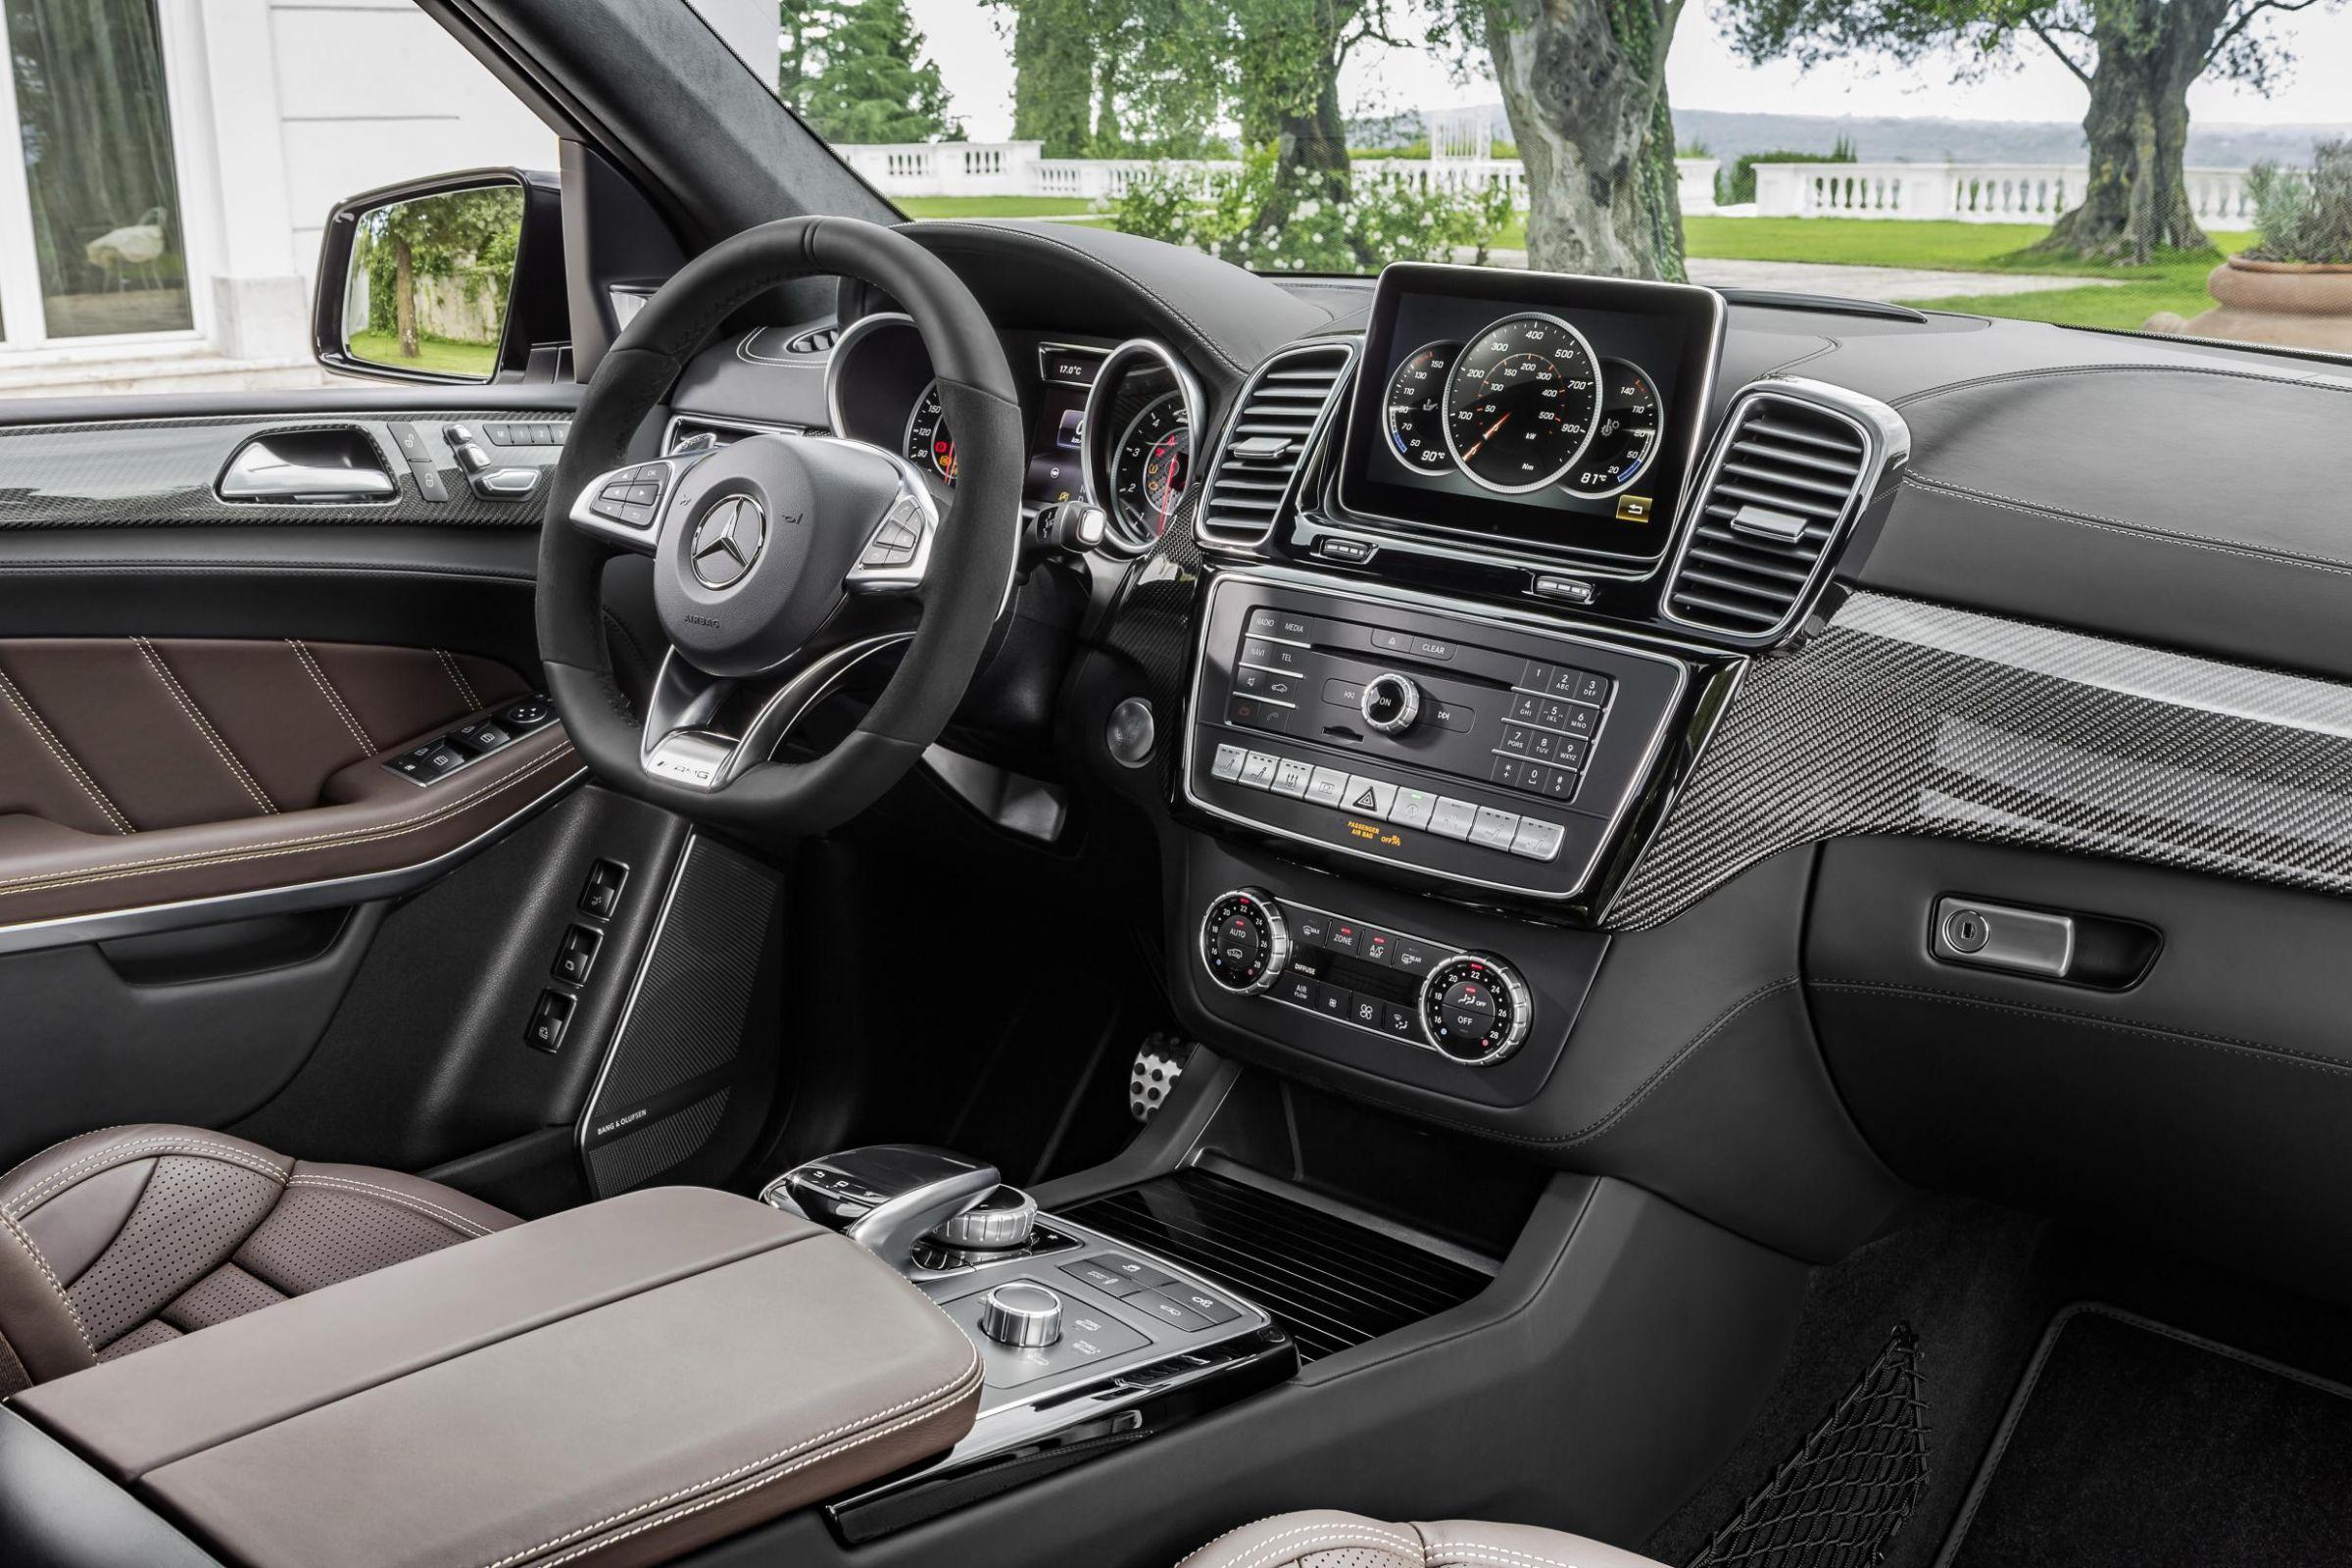 Inside the Mercedes-Benz GLS